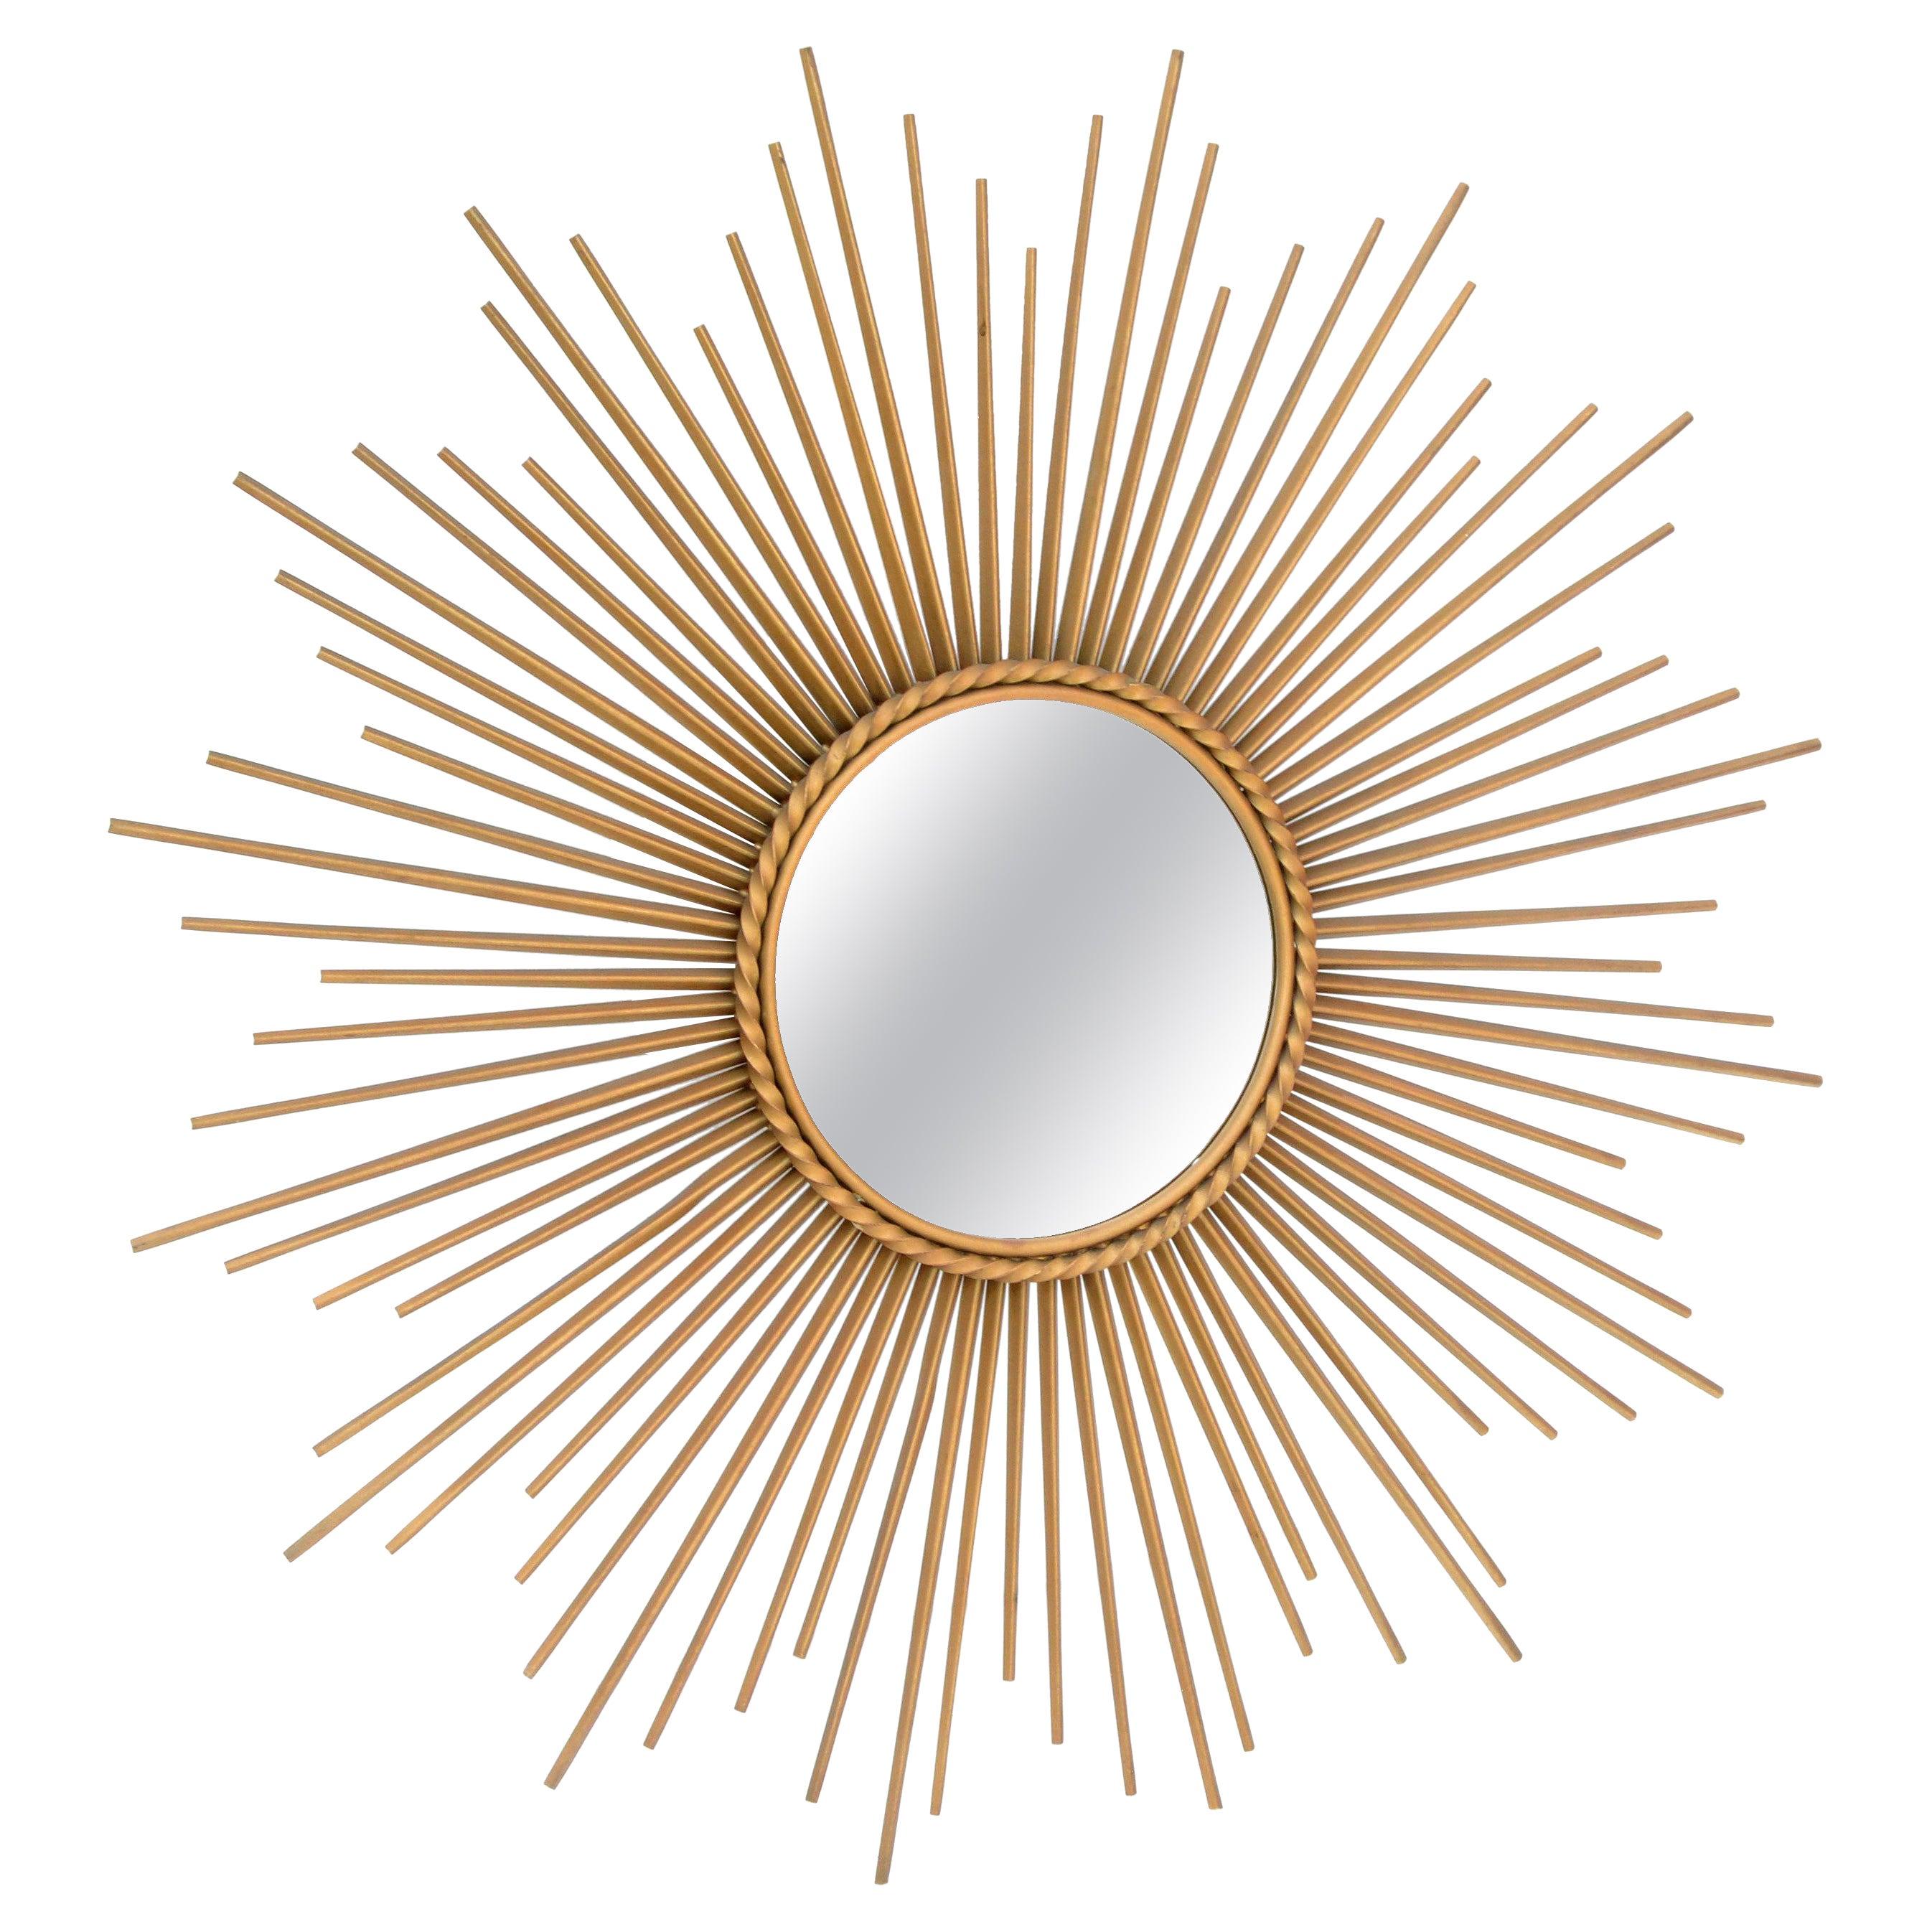 French Chaty Sunburst Mirror Gold Iron Wall Mirror Mid-Century Modern